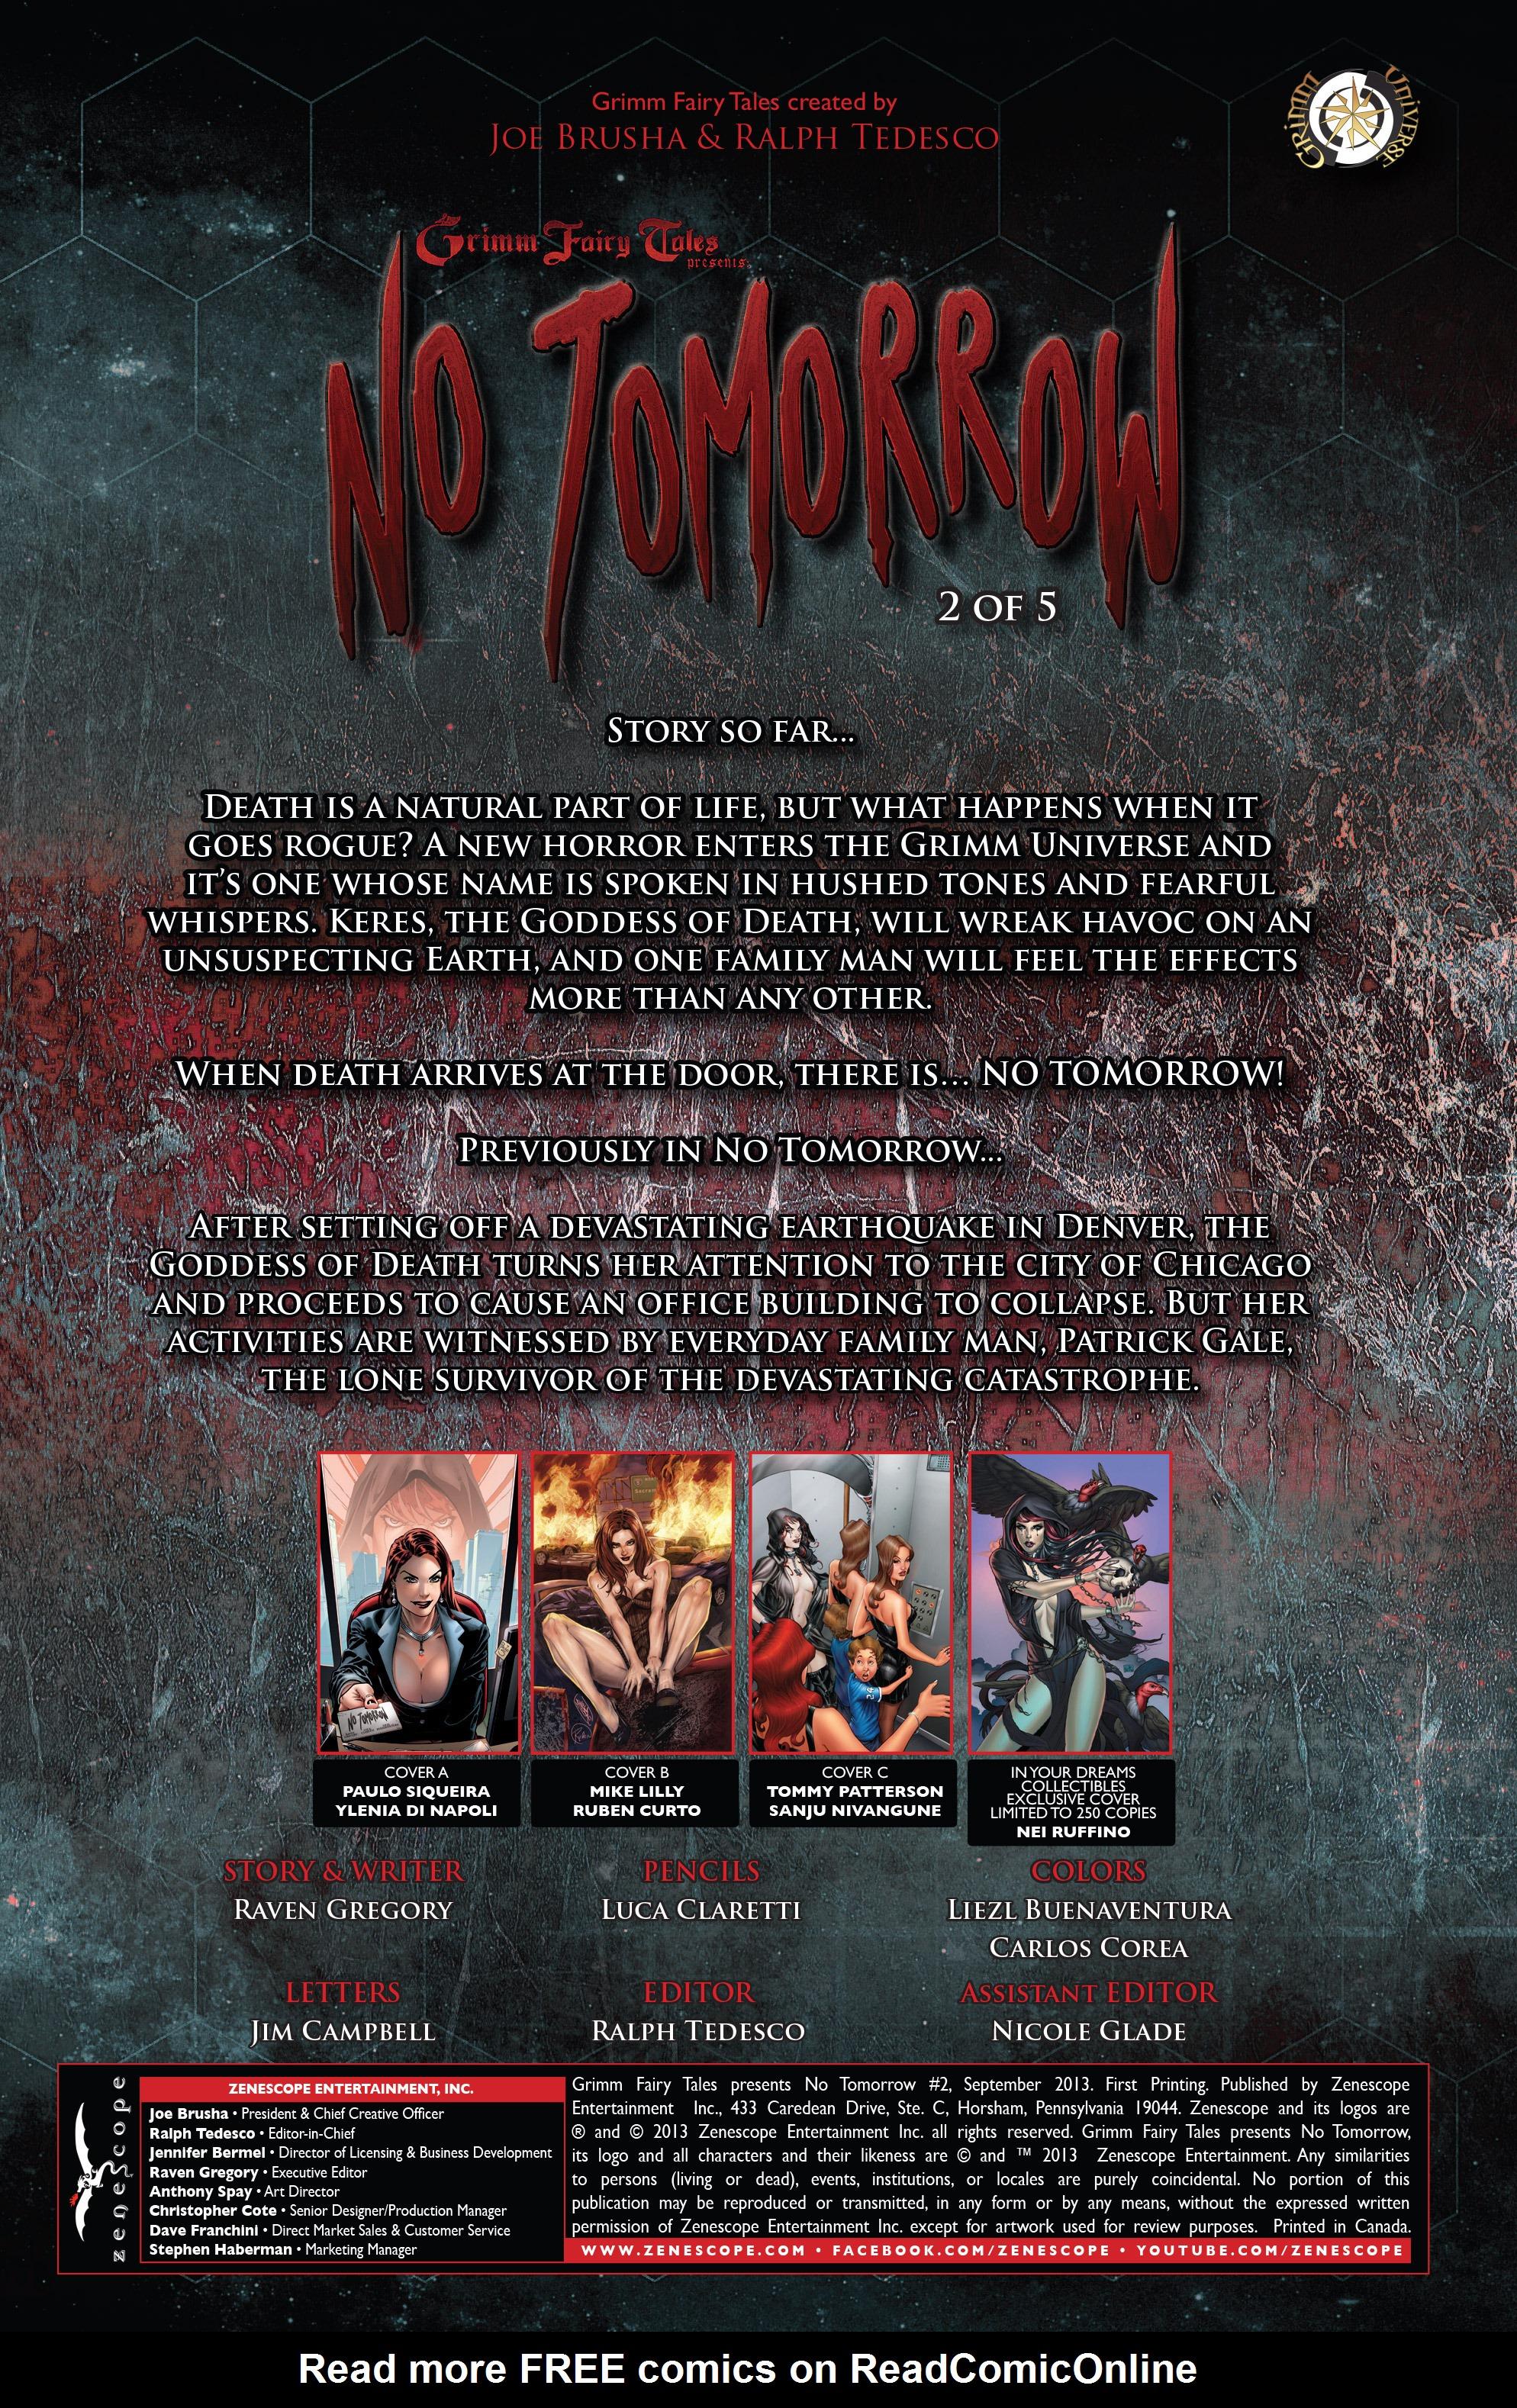 Read online Grimm Fairy Tales presents No Tomorrow comic -  Issue # TPB - 27